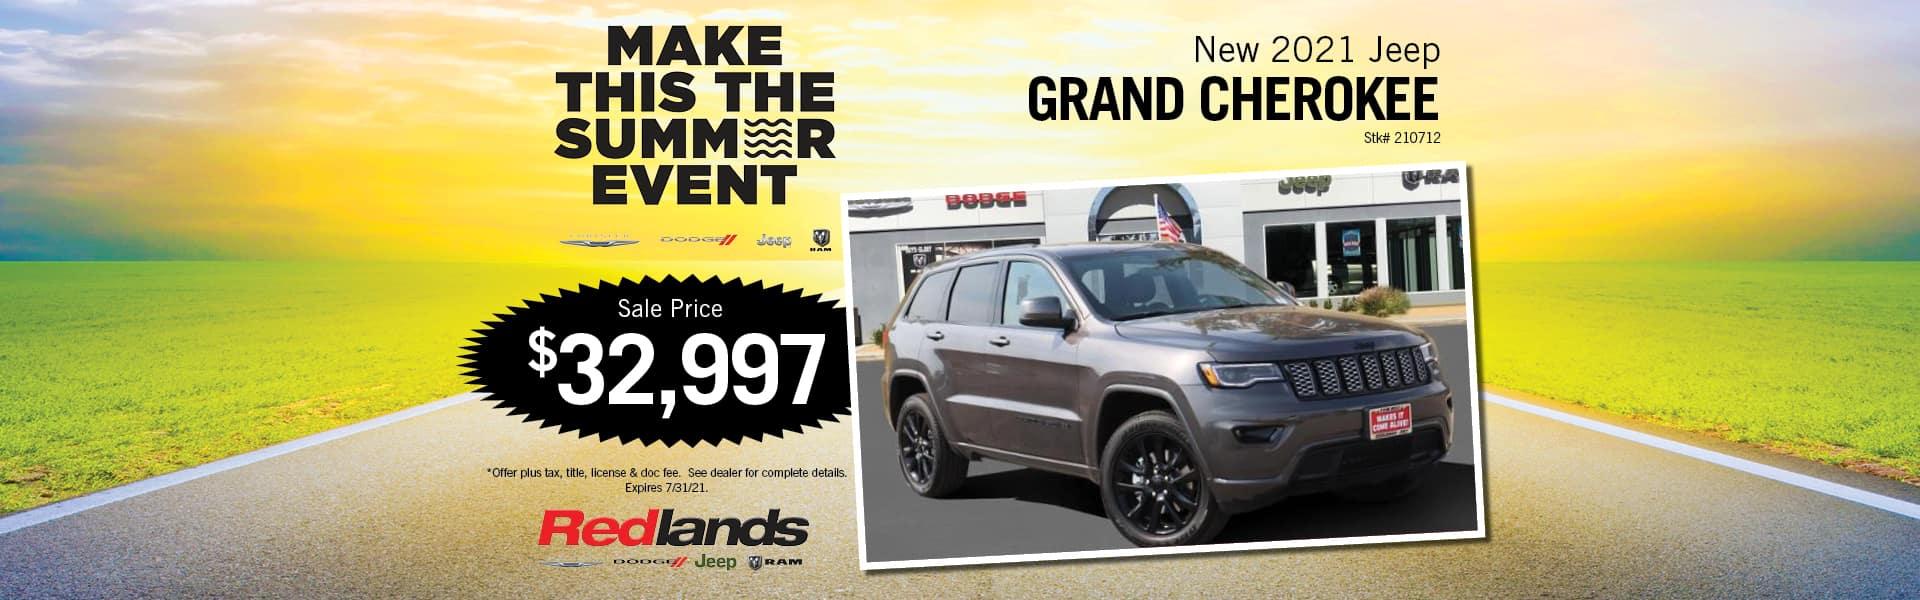 2021 Jeep Grand Cherokee Special Offer | Redlands CDJR